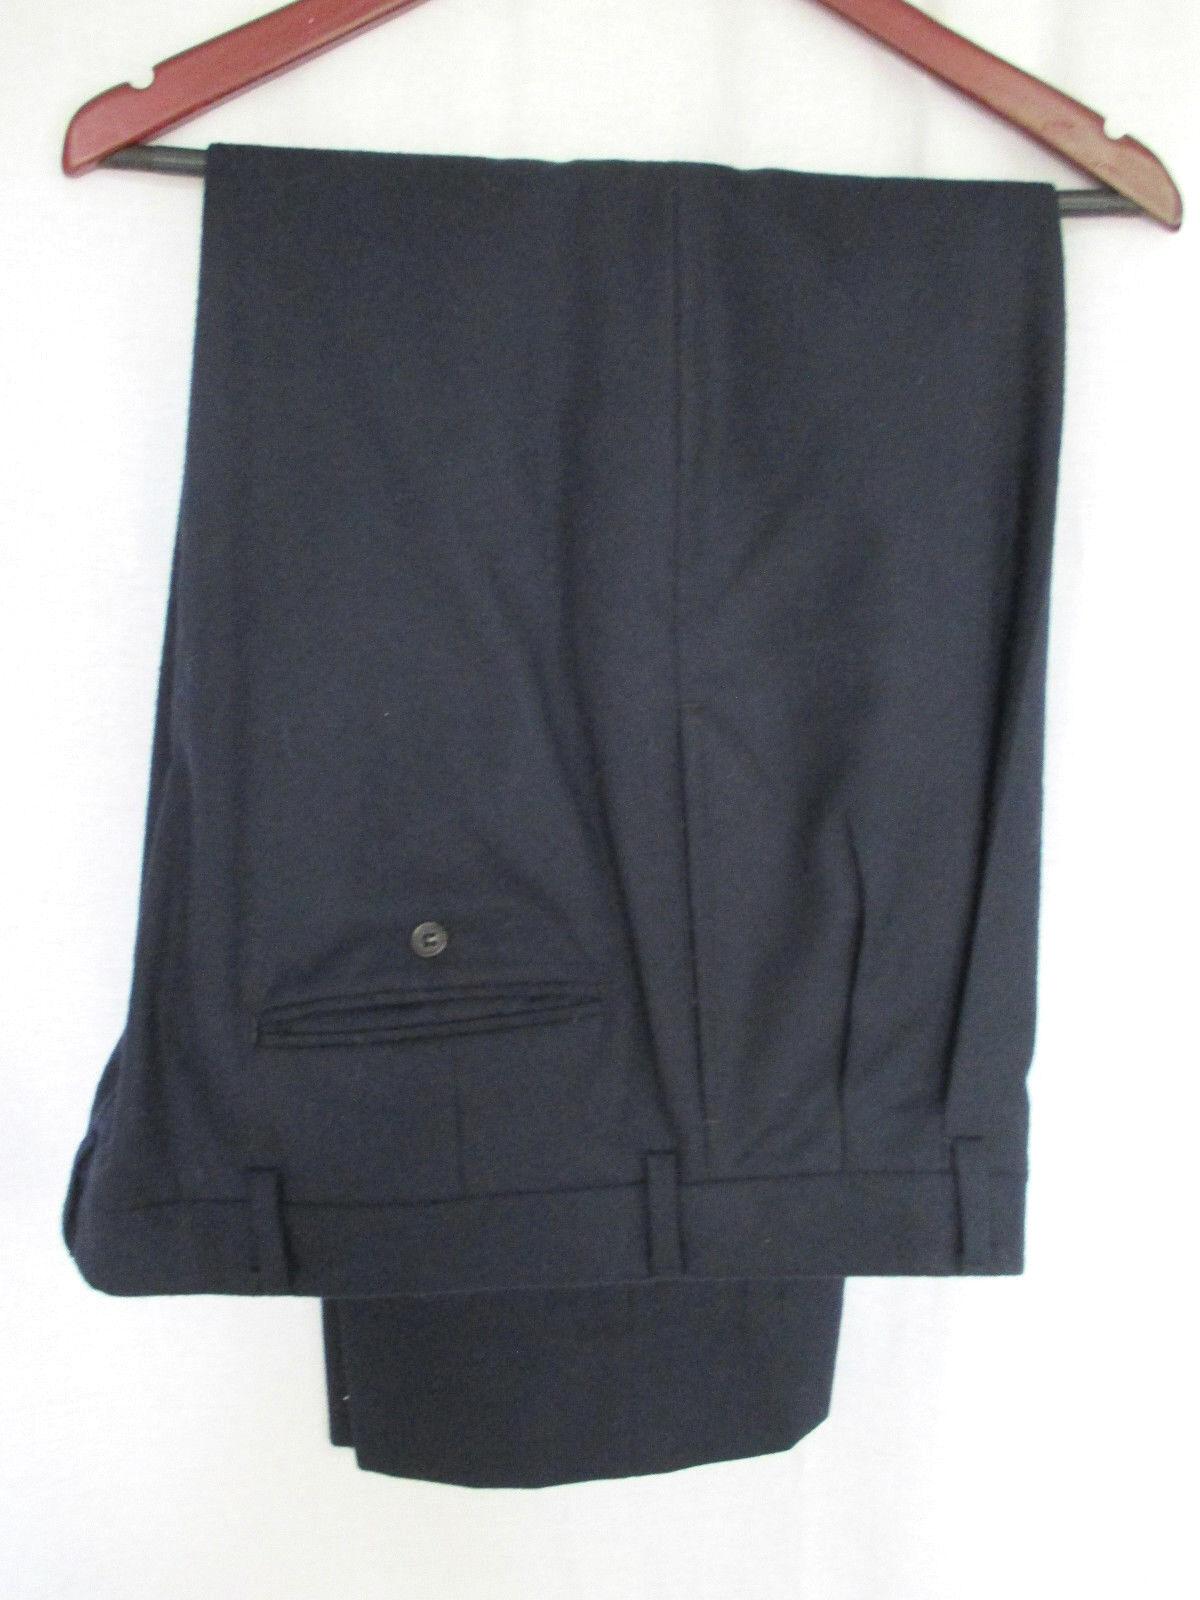 Roundtree & Yorke Men's Pants 42x26.5 NWT Midnight Navy 100% Cotton